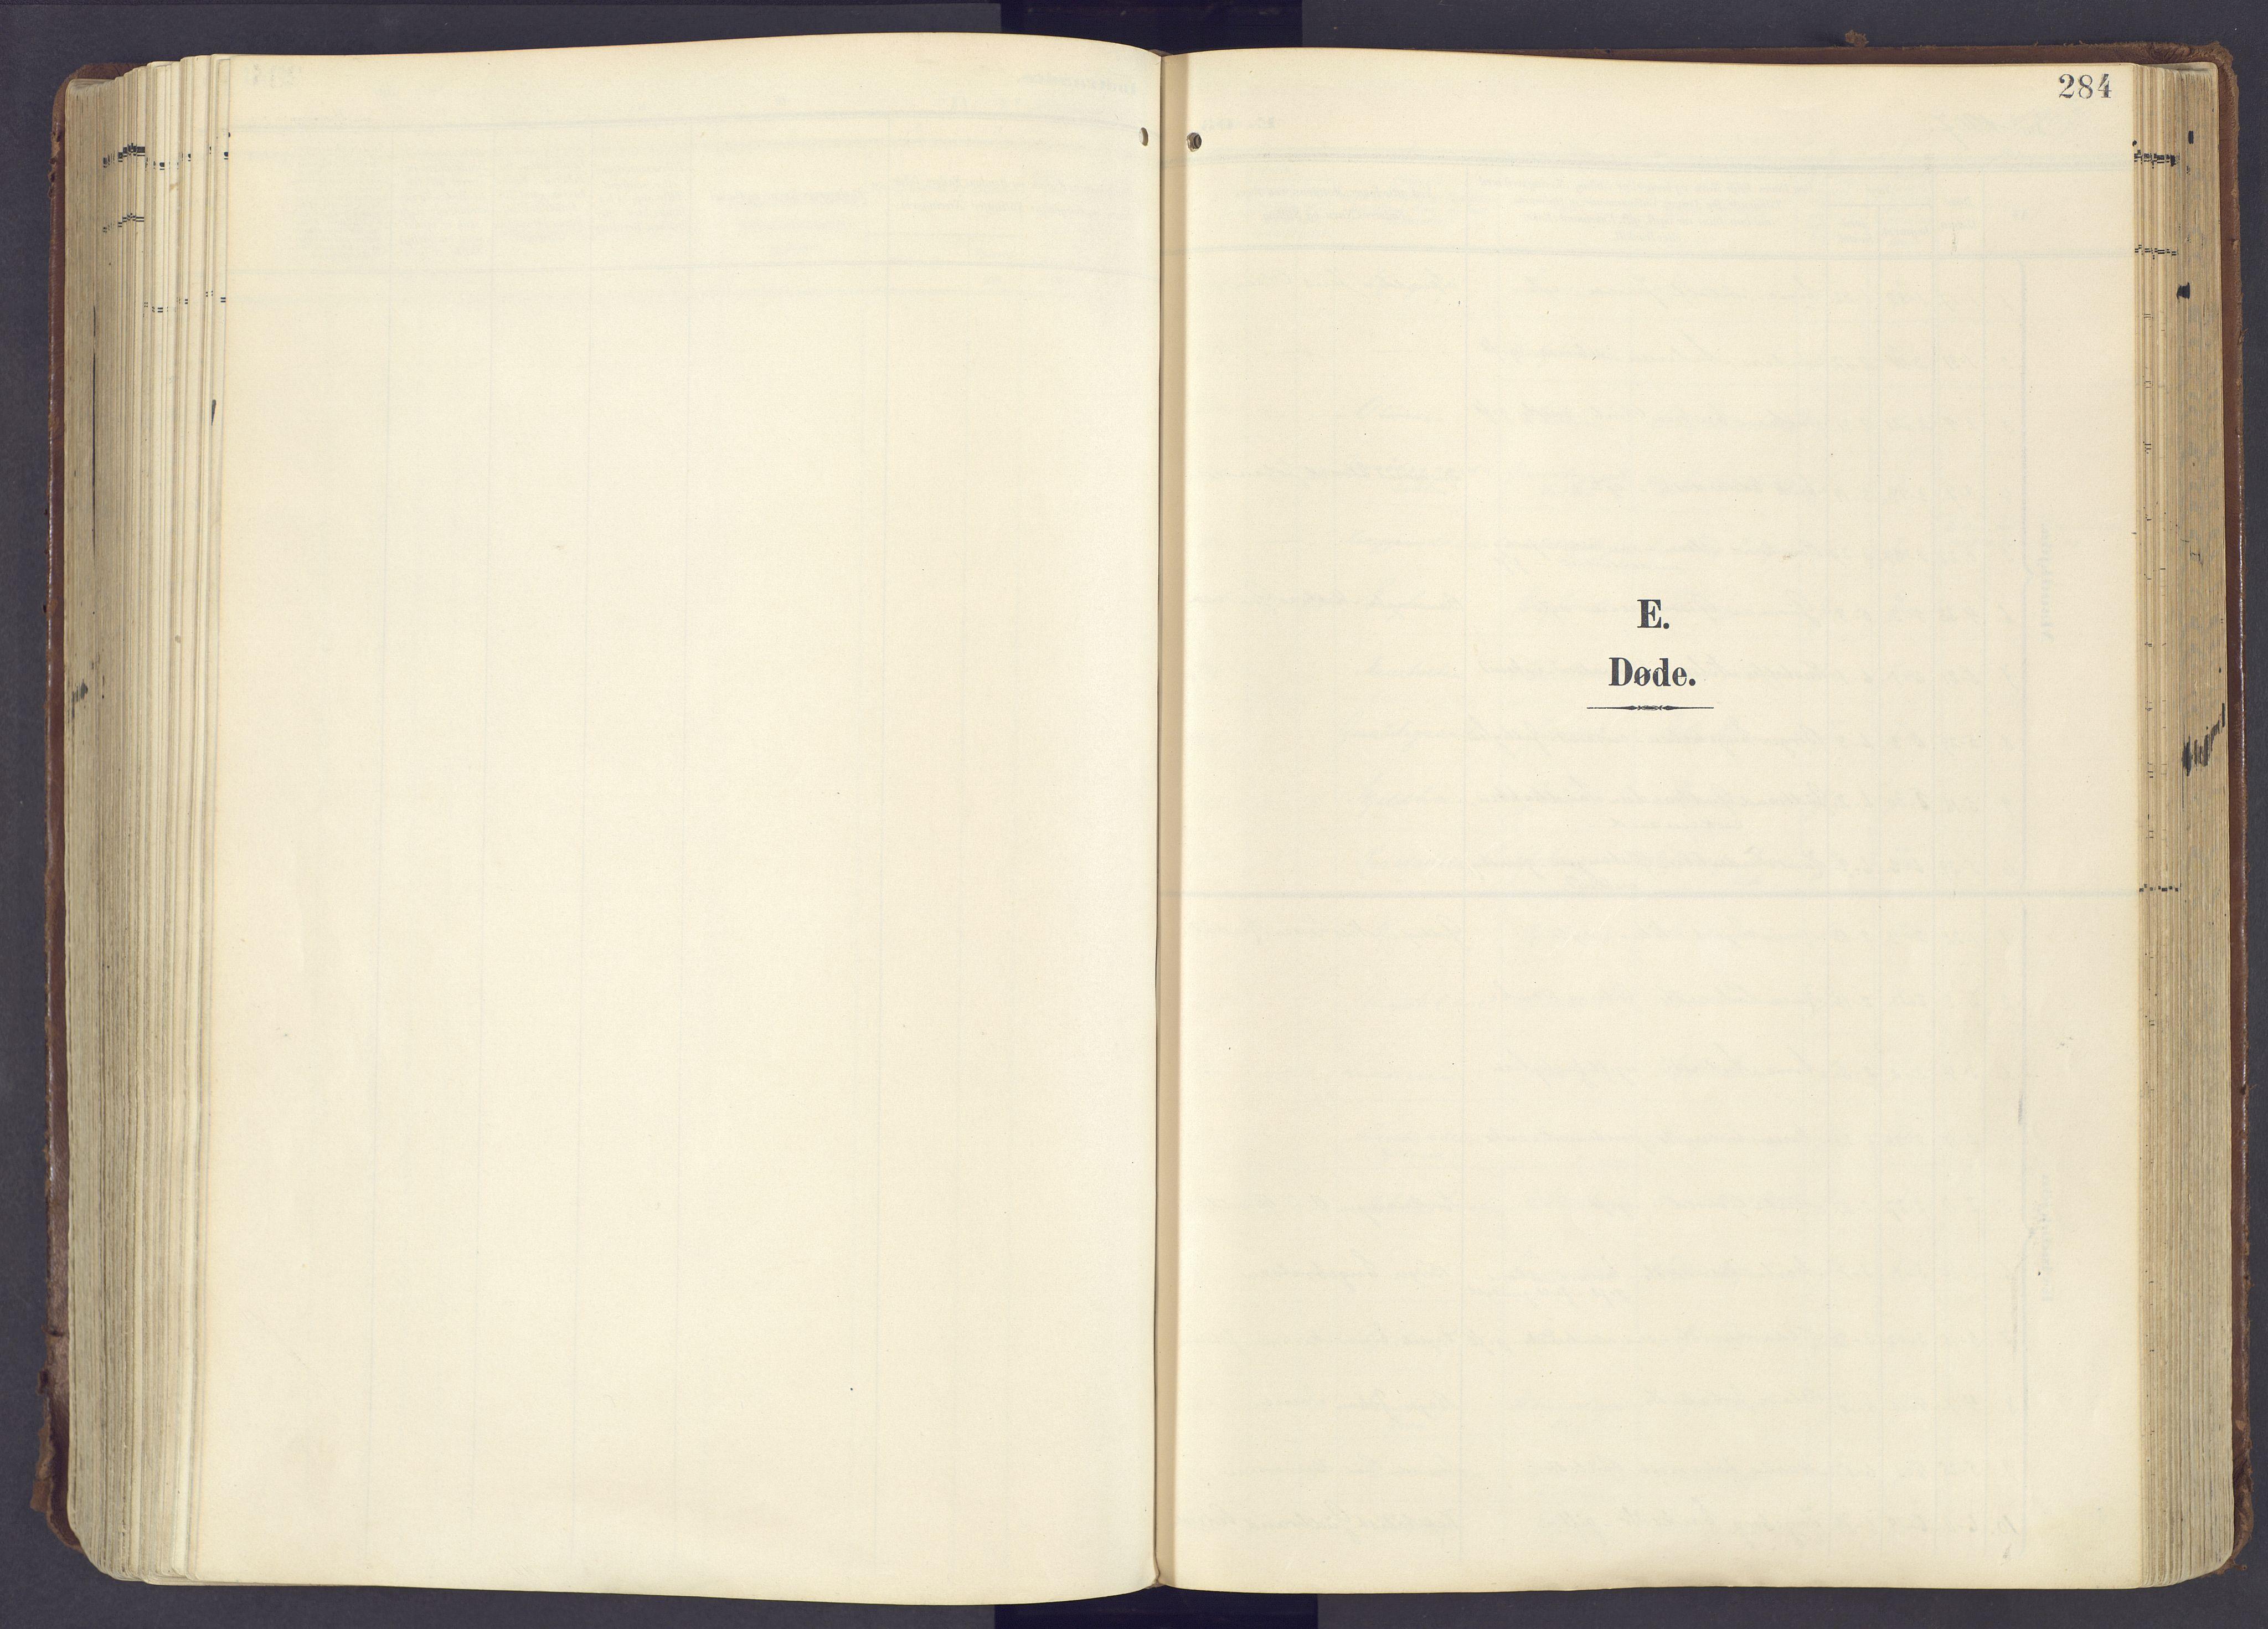 SAH, Lunner prestekontor, H/Ha/Haa/L0001: Ministerialbok nr. 1, 1907-1922, s. 284